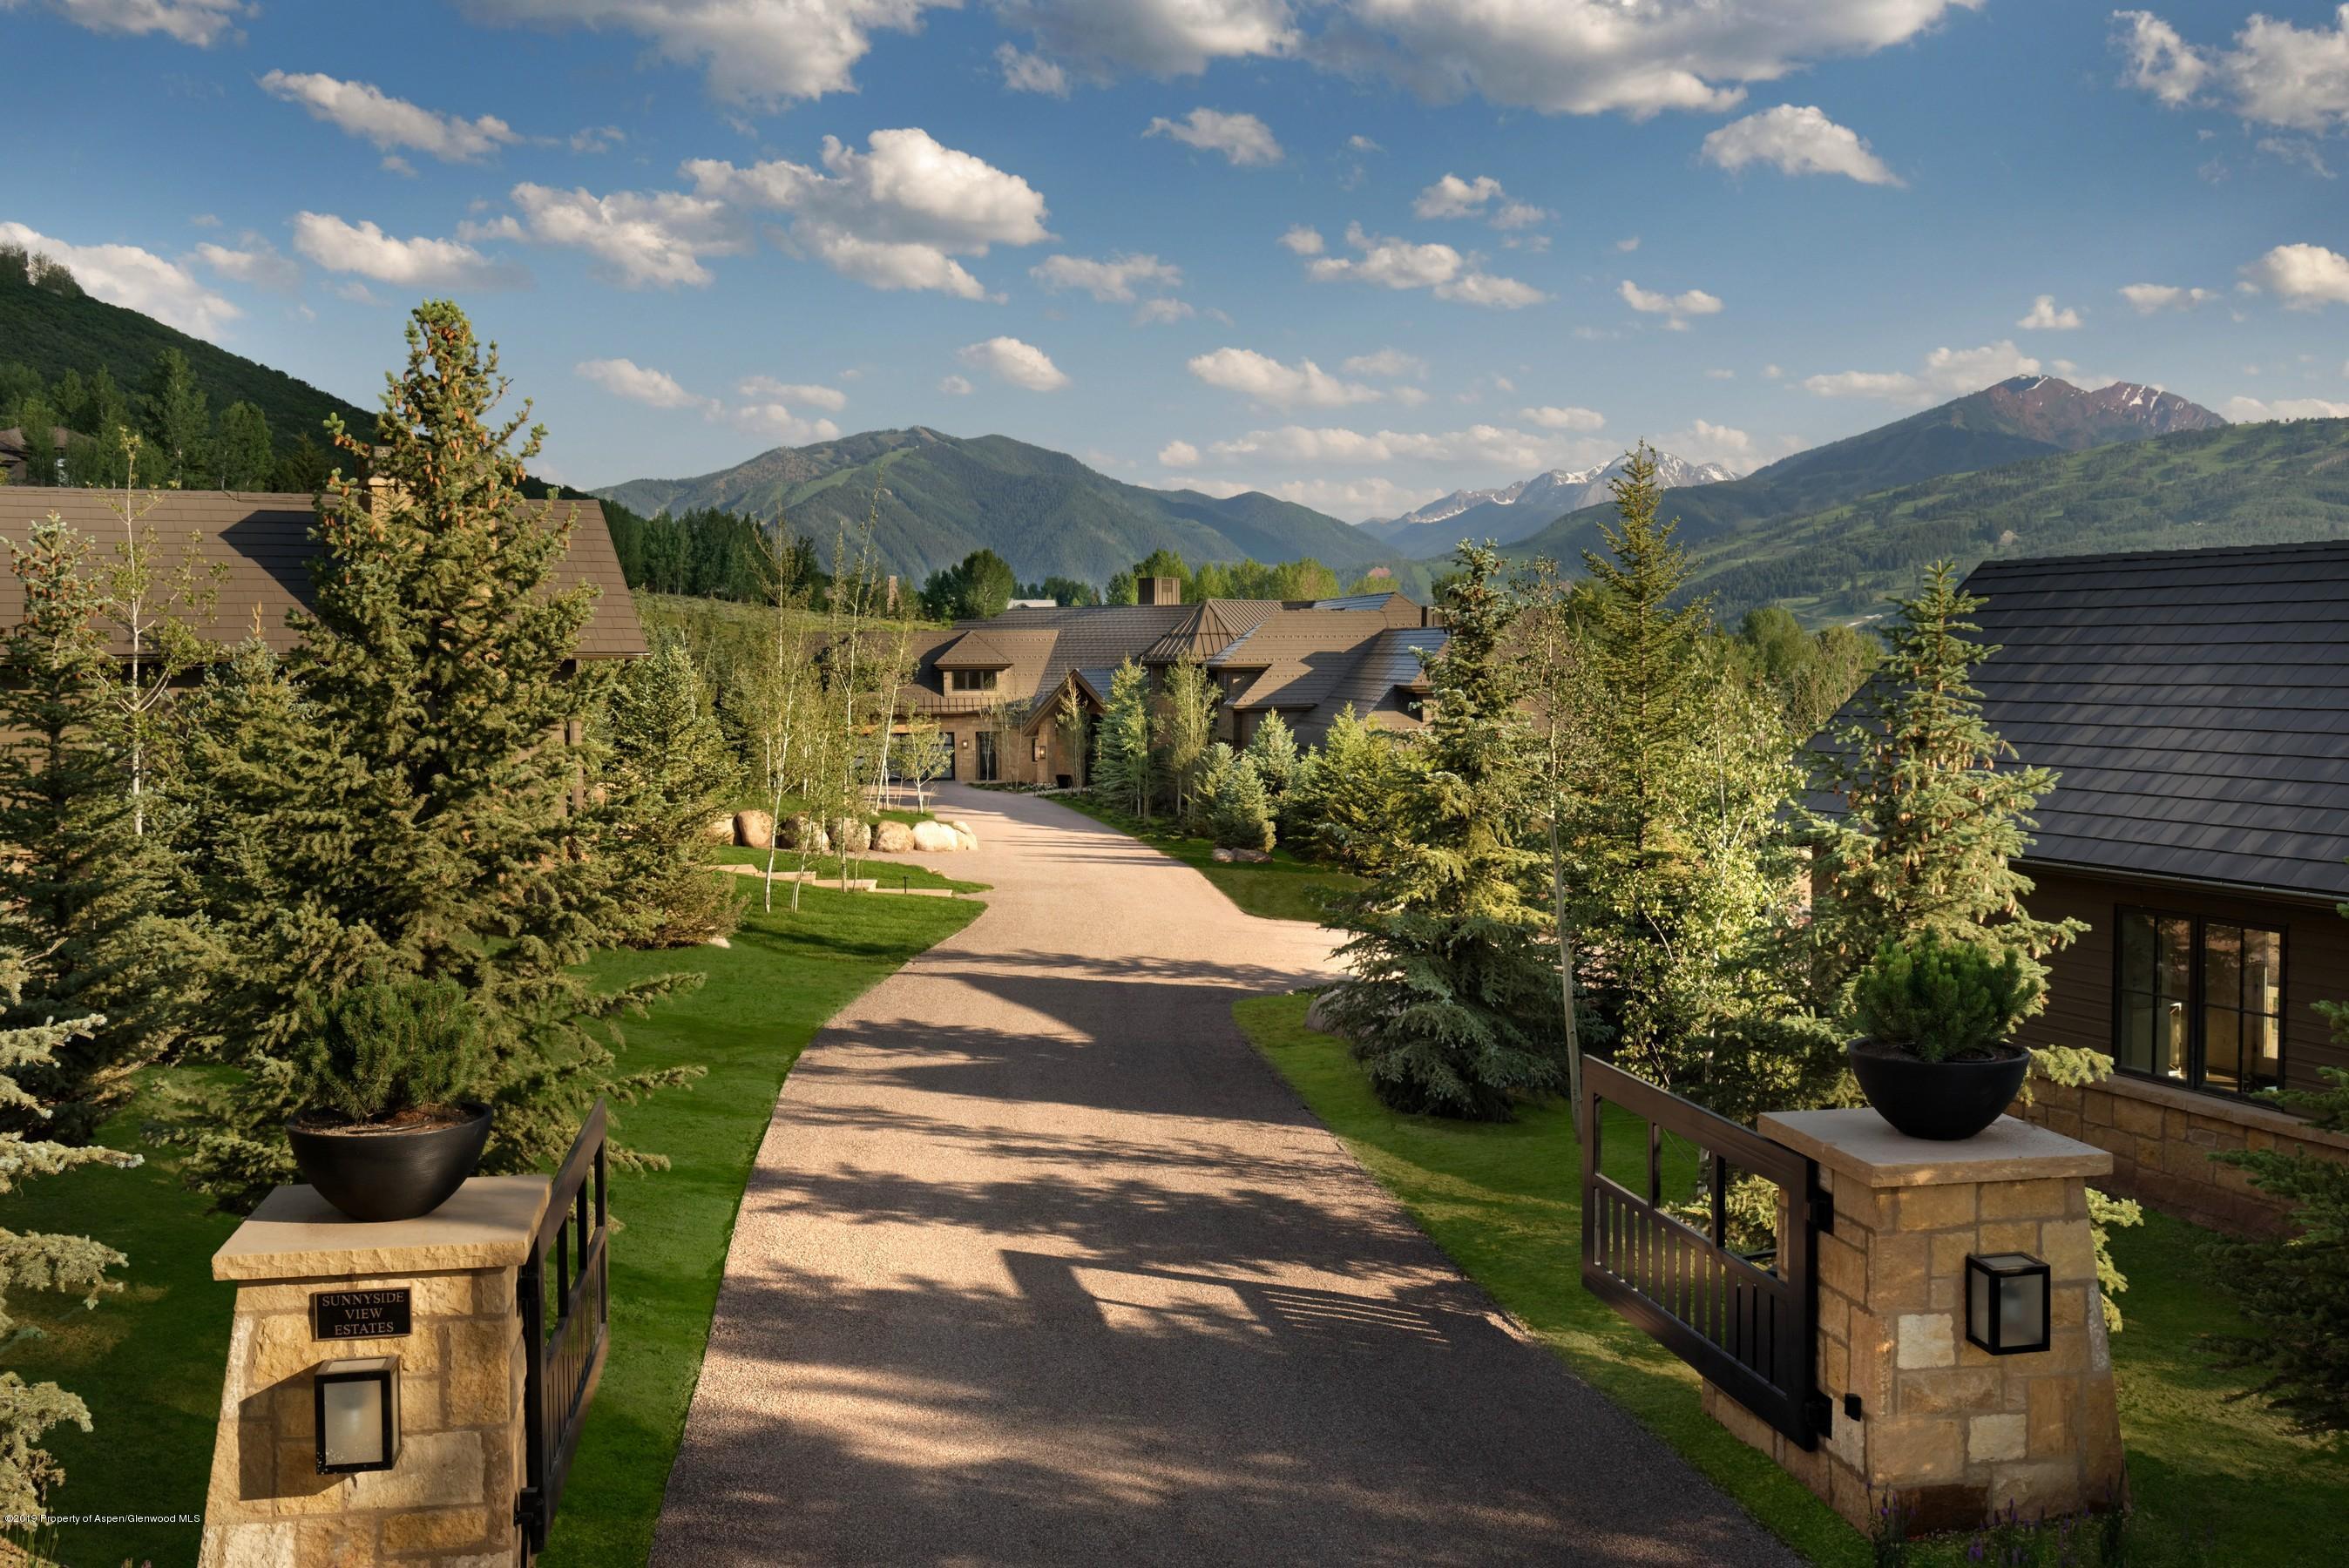 61 Sunnyside Way - Aspen, Colorado